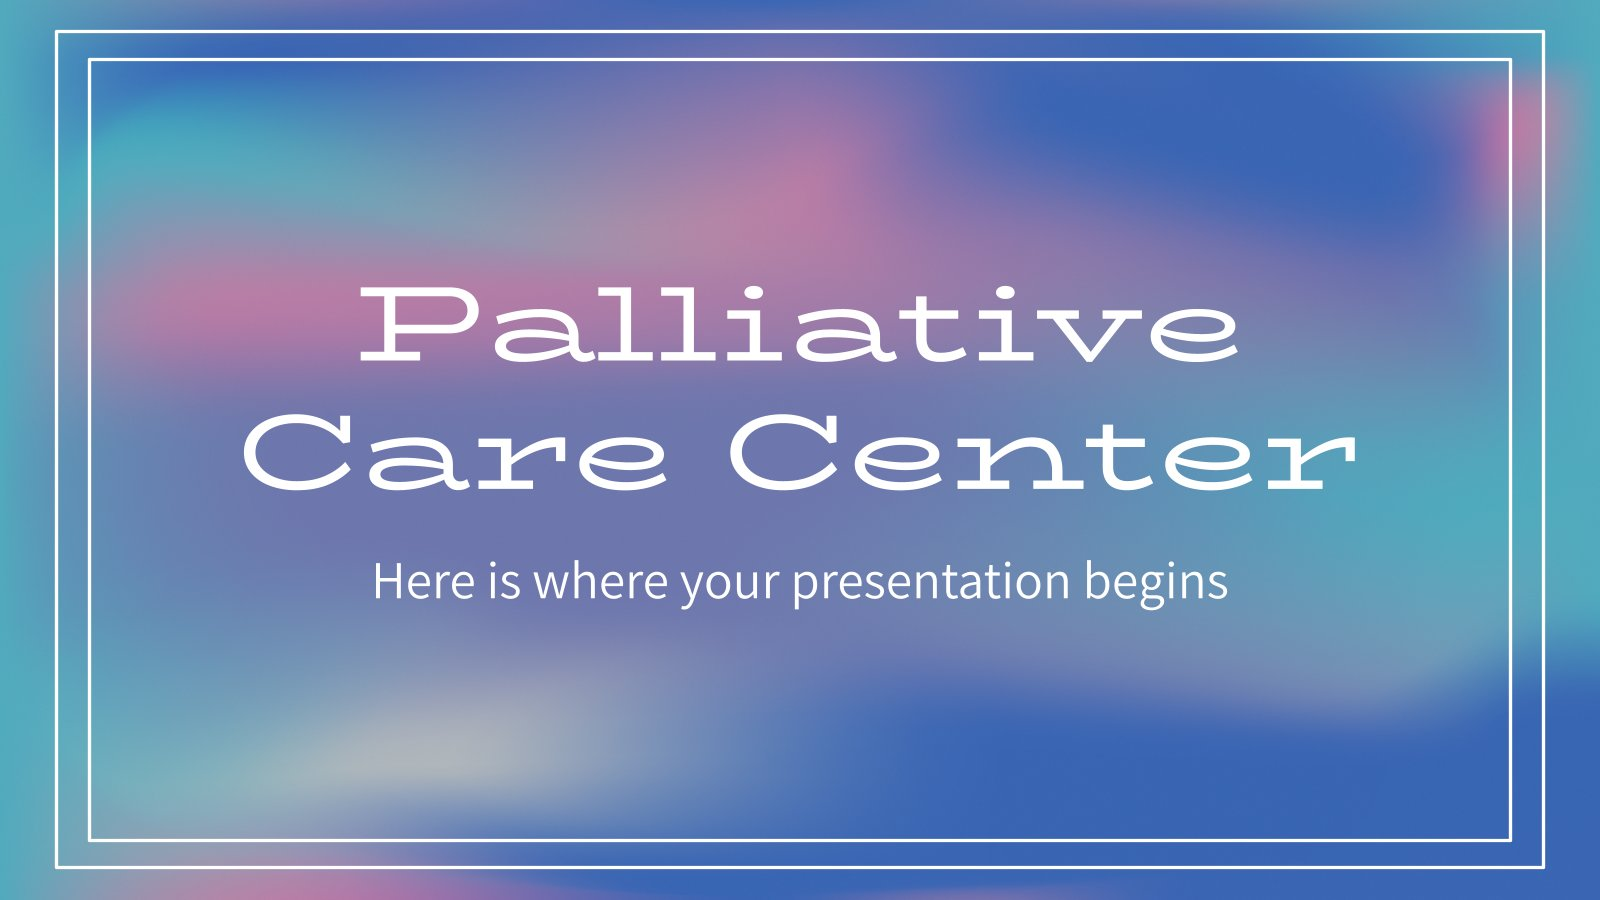 Palliative Care Center presentation template